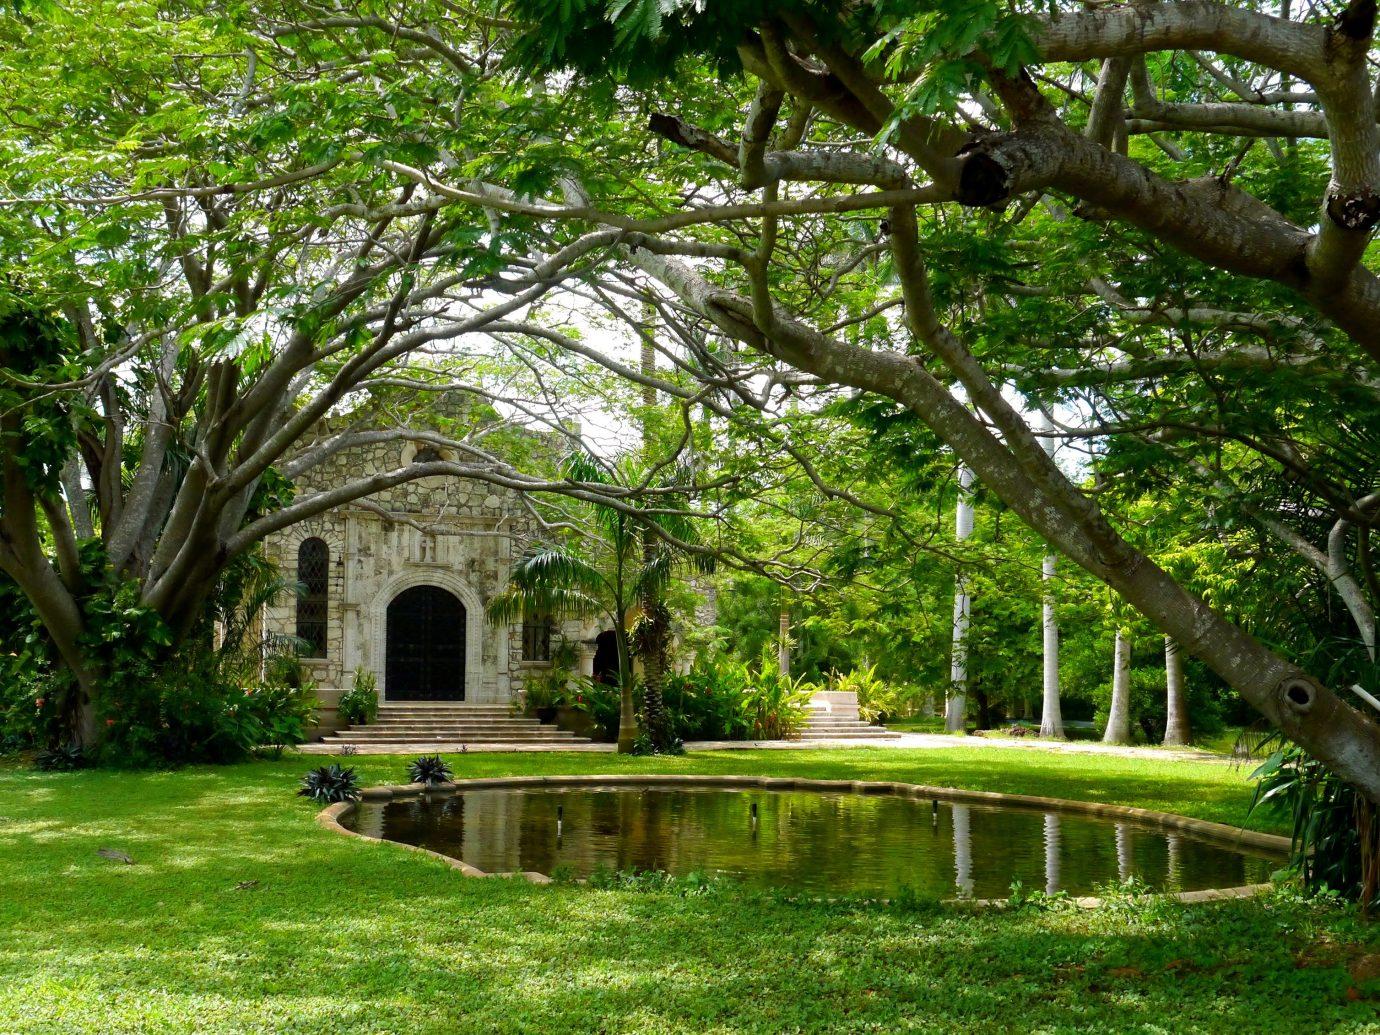 Hotels Trip Ideas grass tree outdoor park botany Garden estate plant flower woodland backyard botanical garden Jungle yard court lush